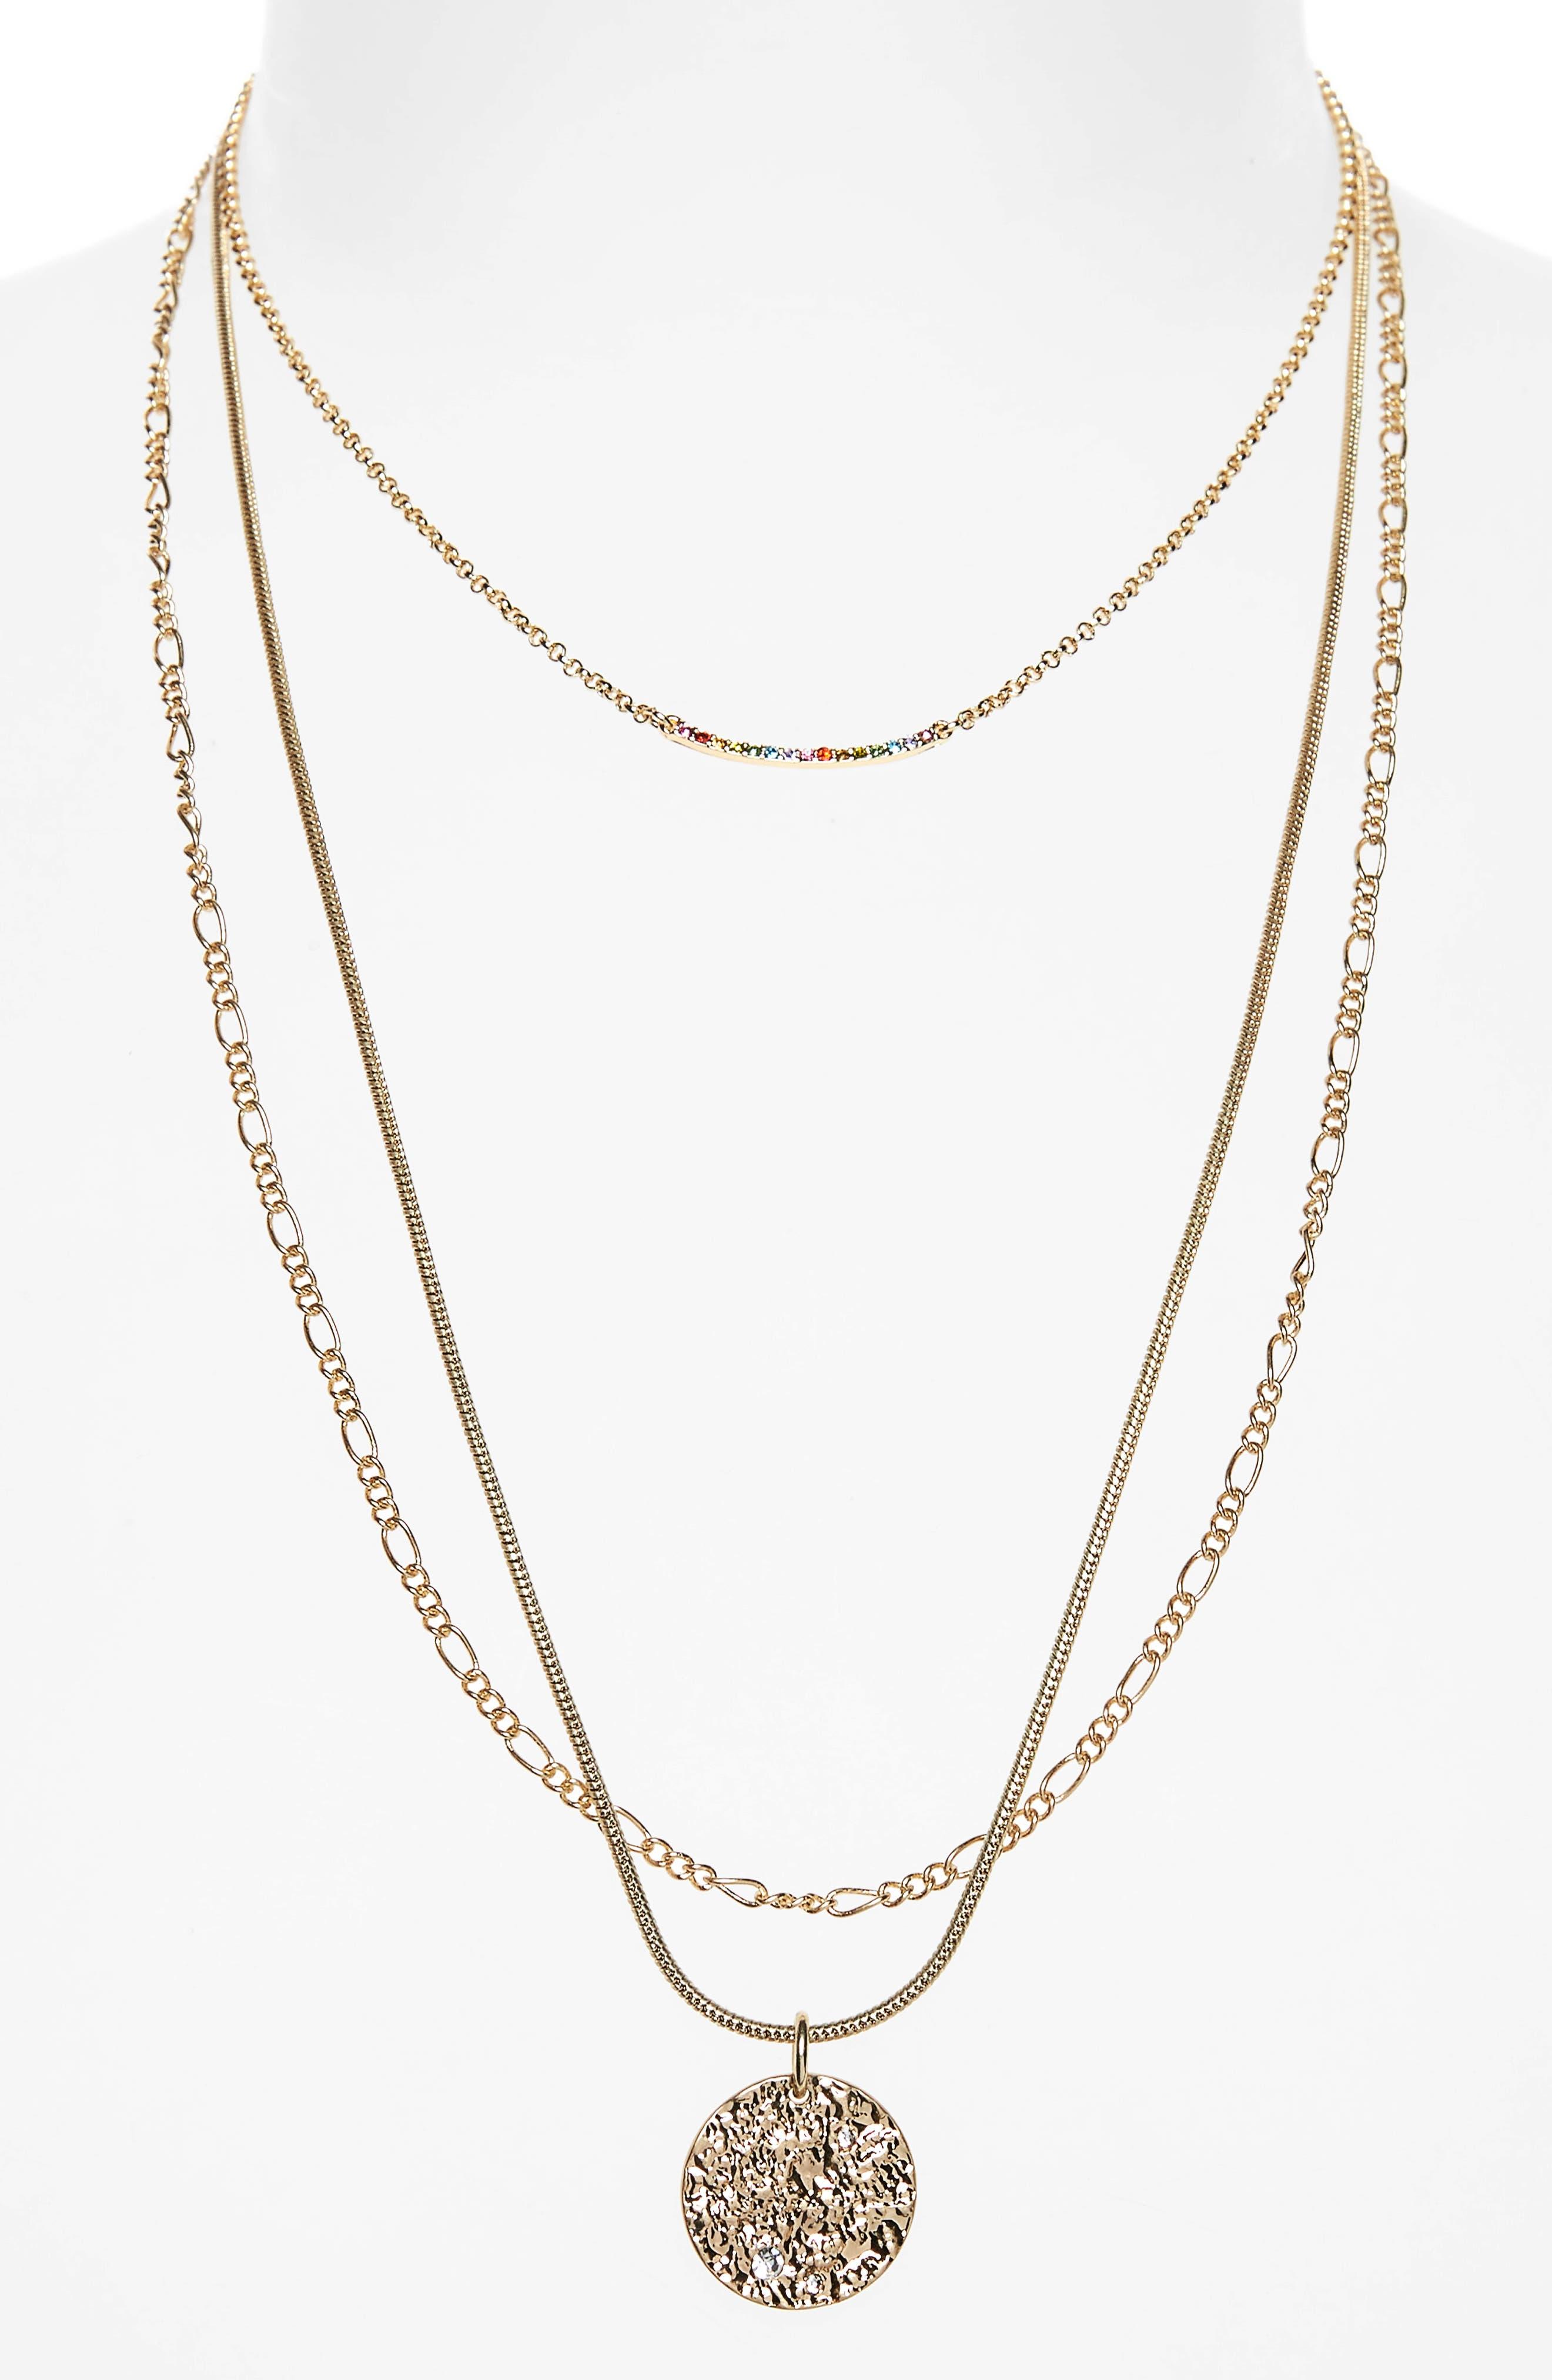 Multistrand Bar & Pendant Necklace,                             Alternate thumbnail 2, color,                             000